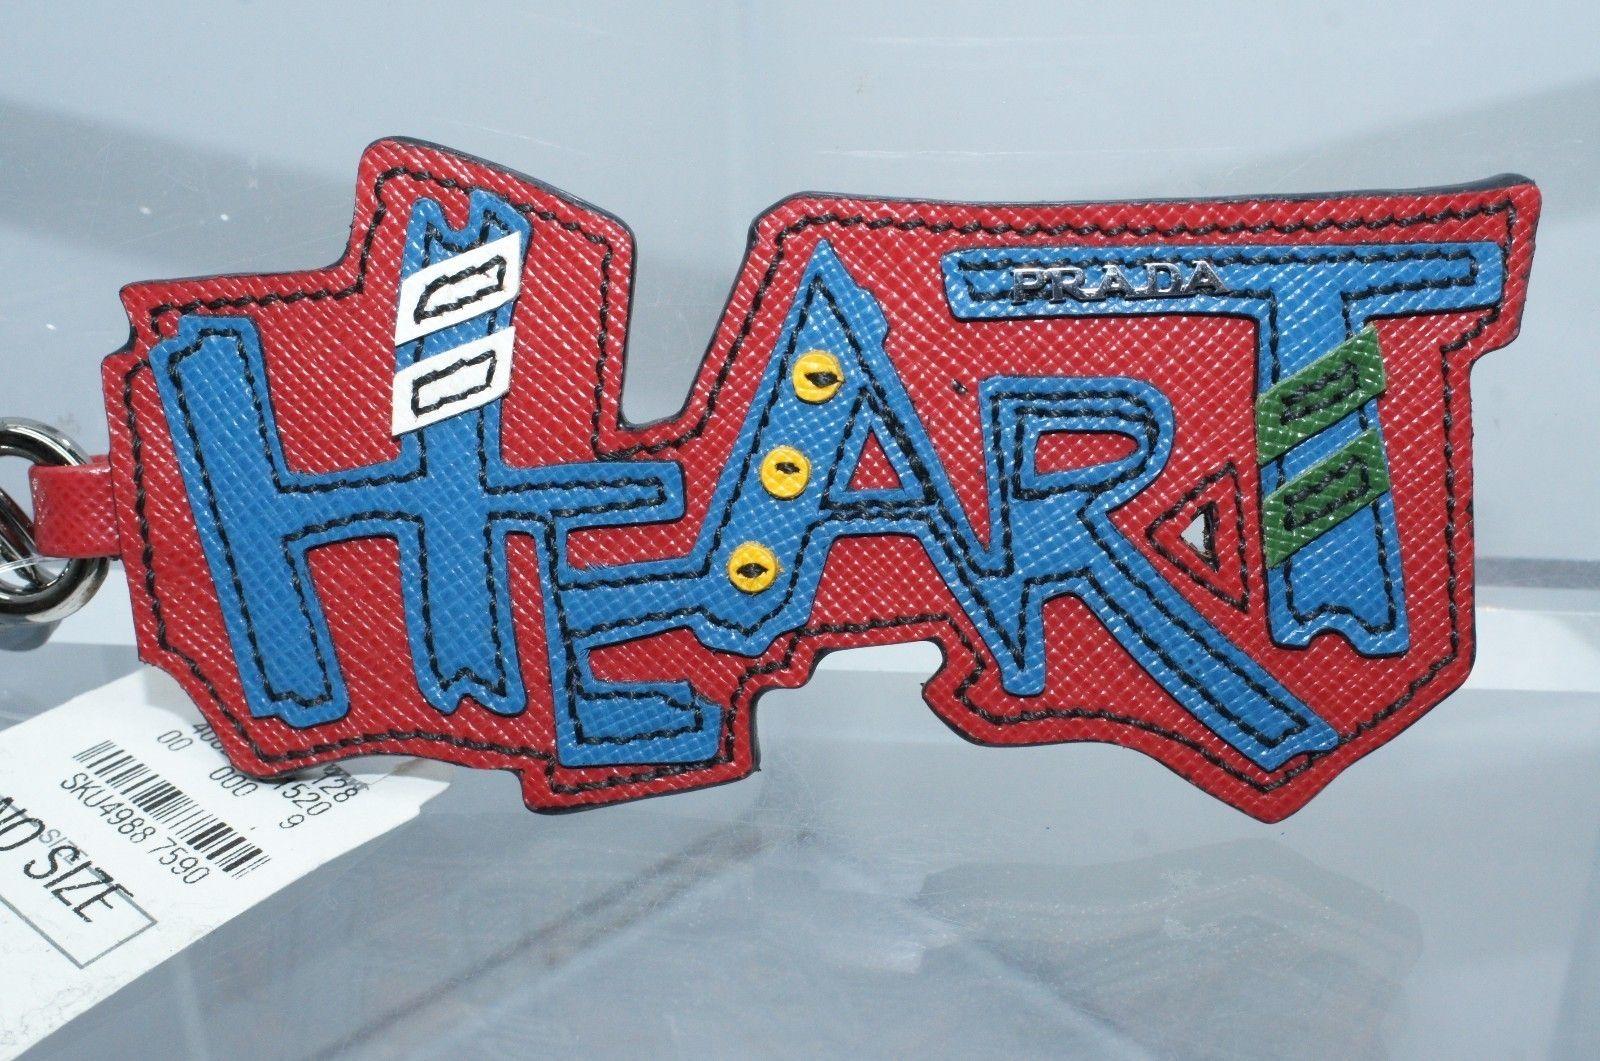 Prada heart key chain